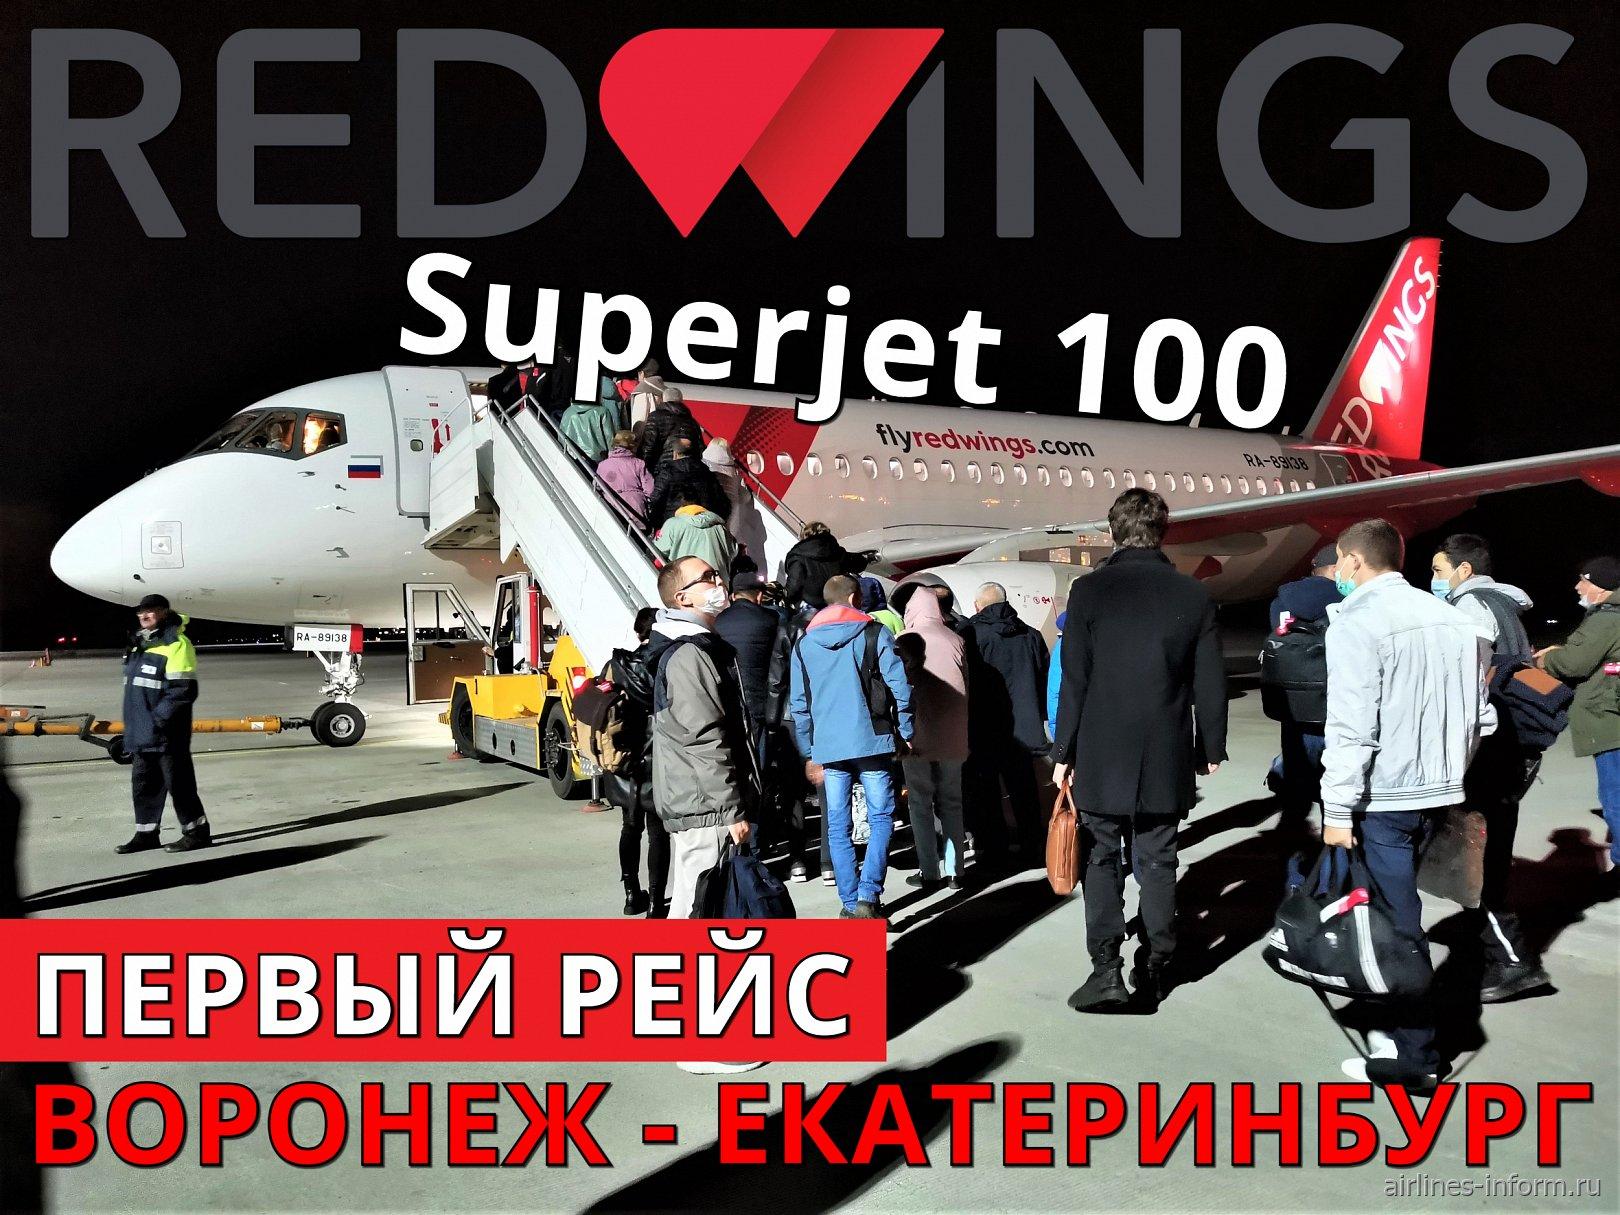 Red Wings: Воронеж - Екатеринбург. Первый рейс